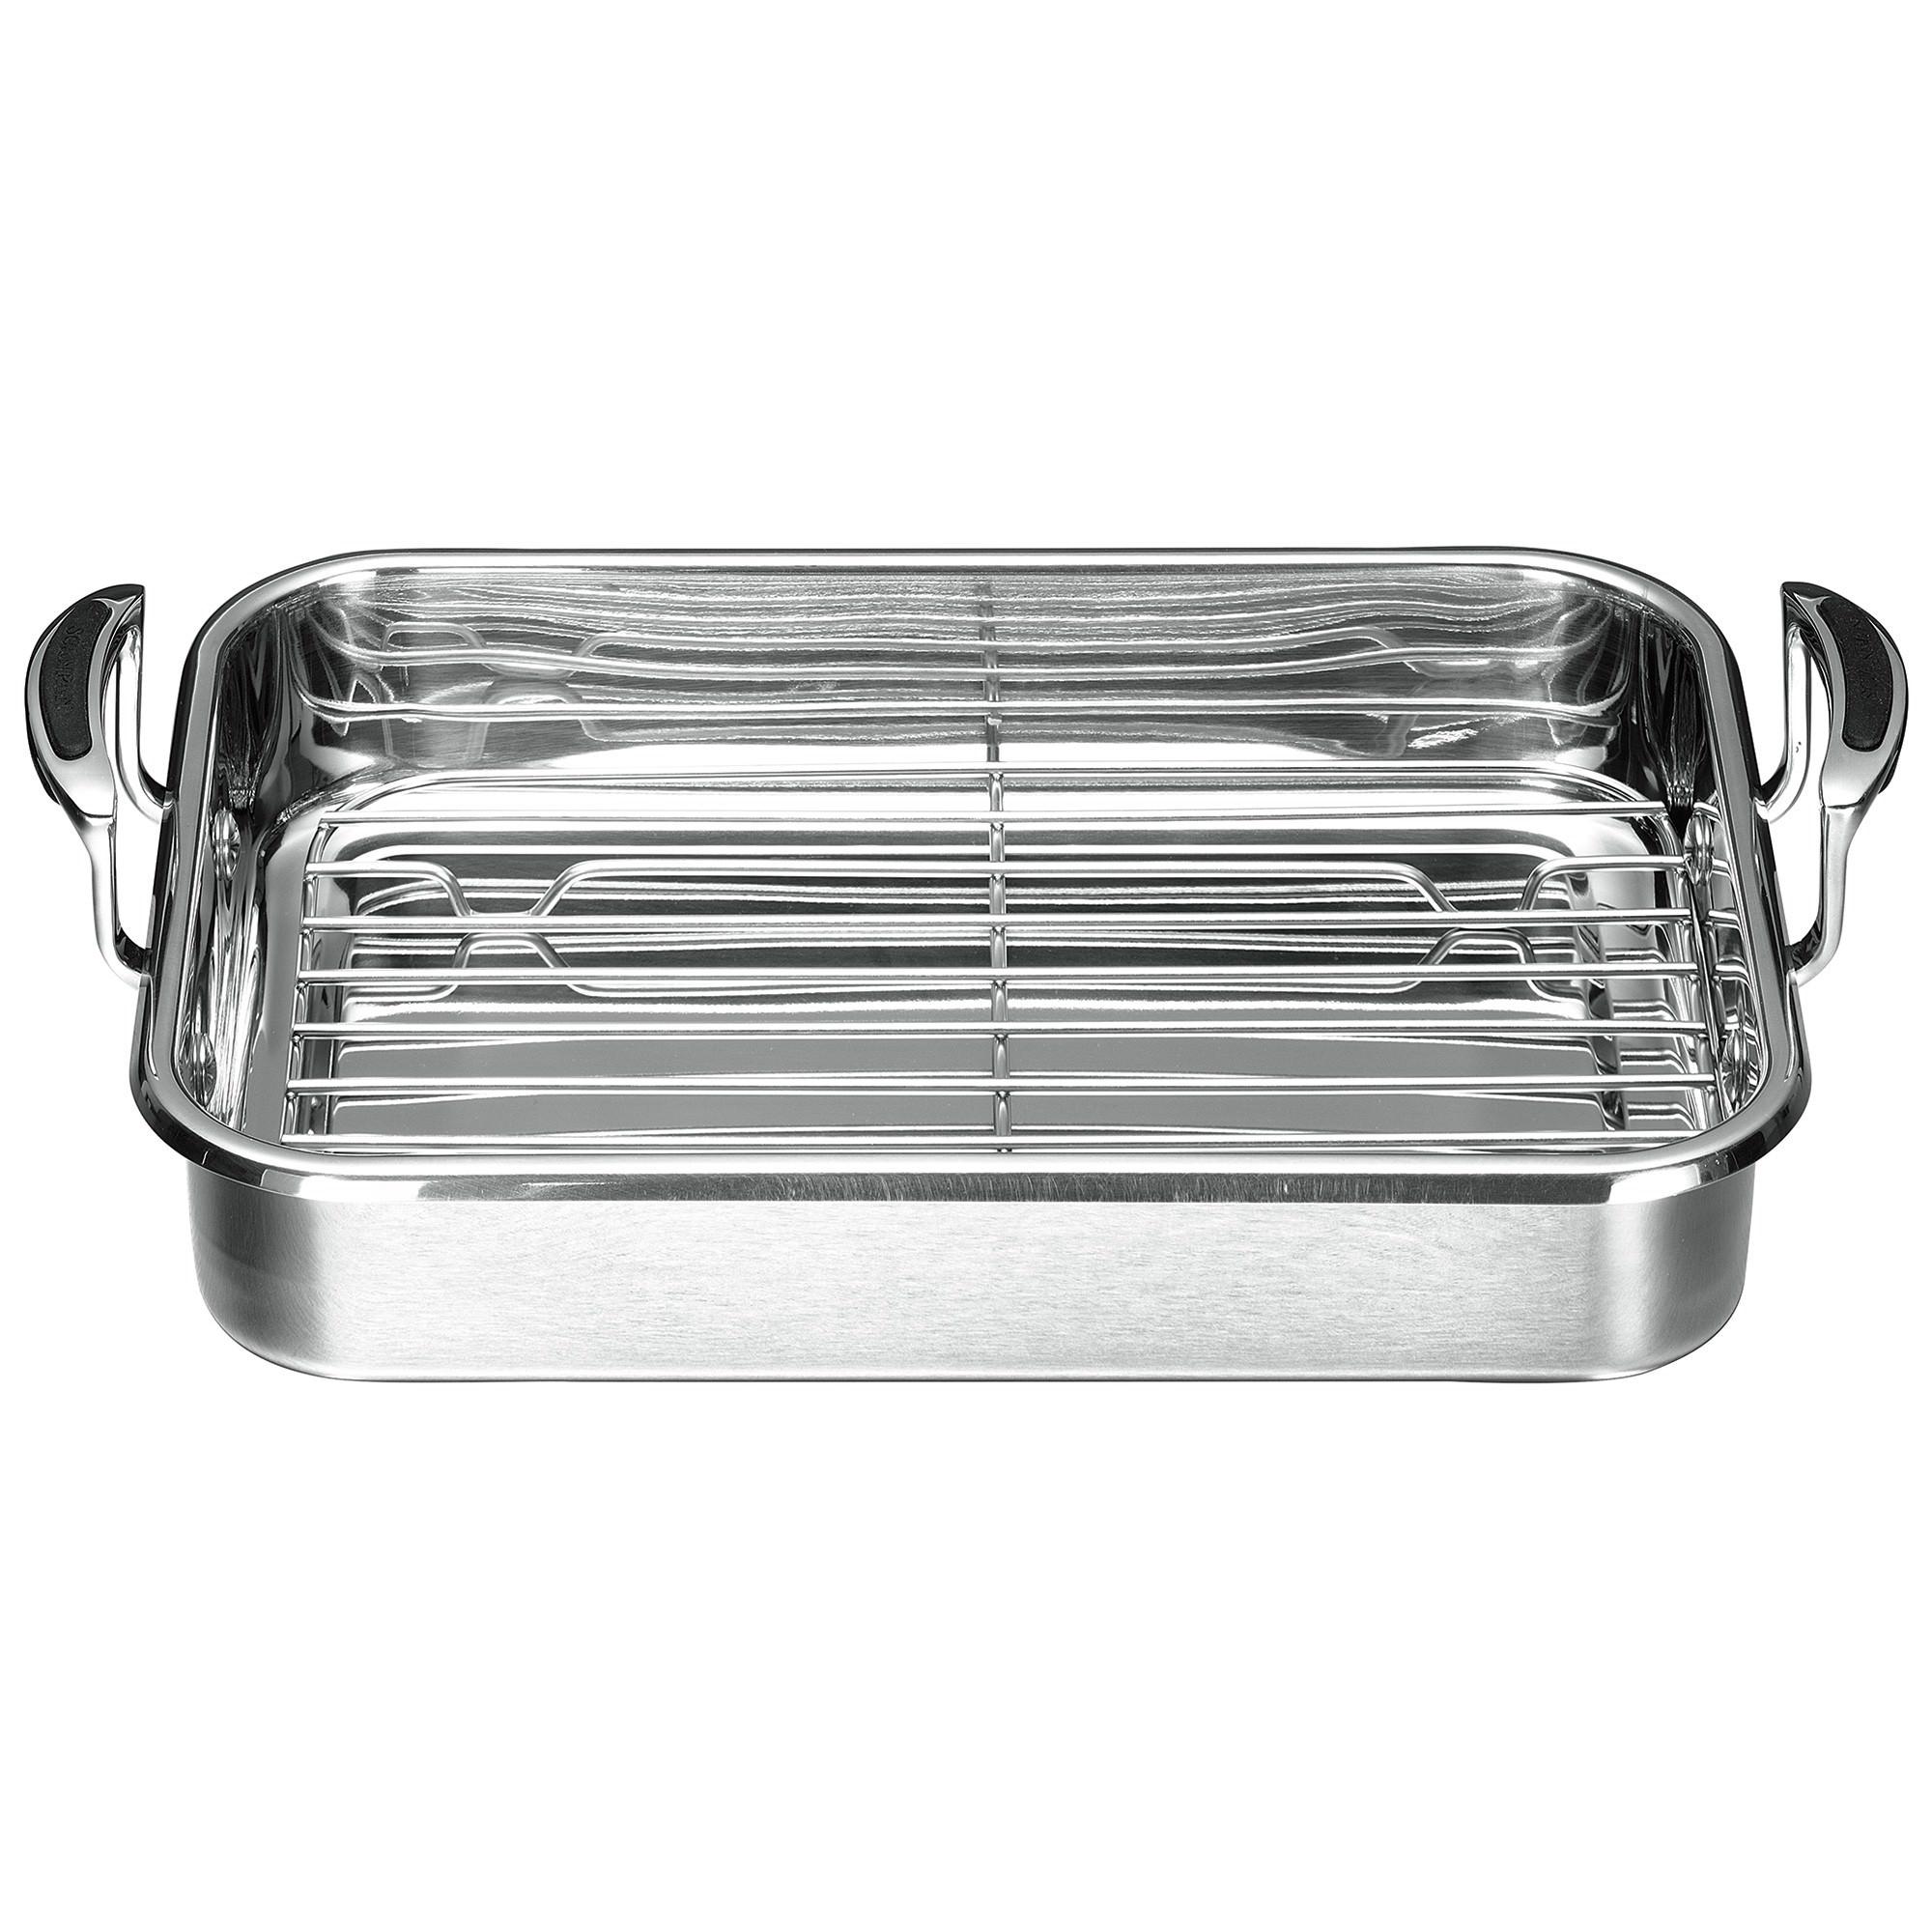 Scanpan Coppernox Roasting Pan with Rack, 33x24cm